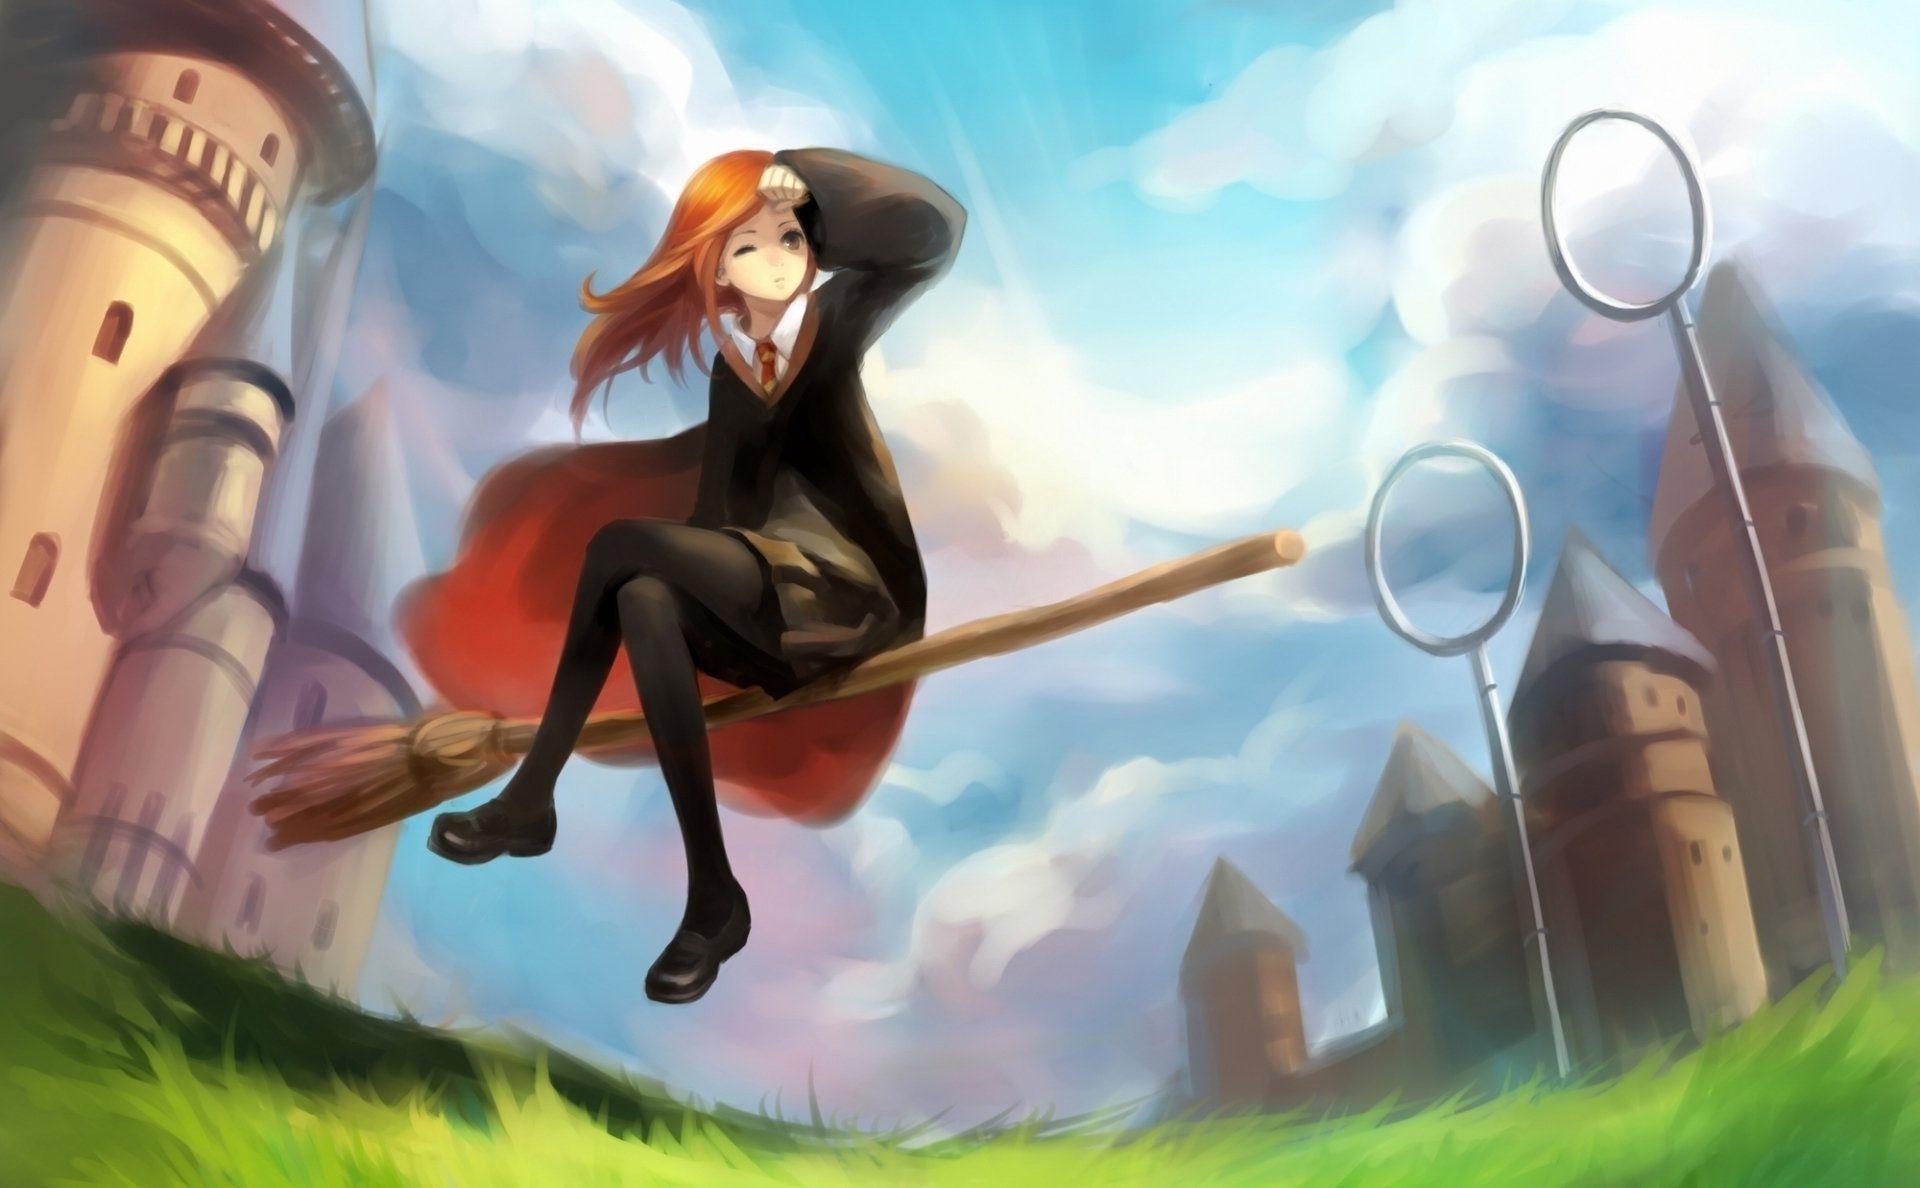 Movie Harry Potter Quidditch Ginny Weasley Wallpaper